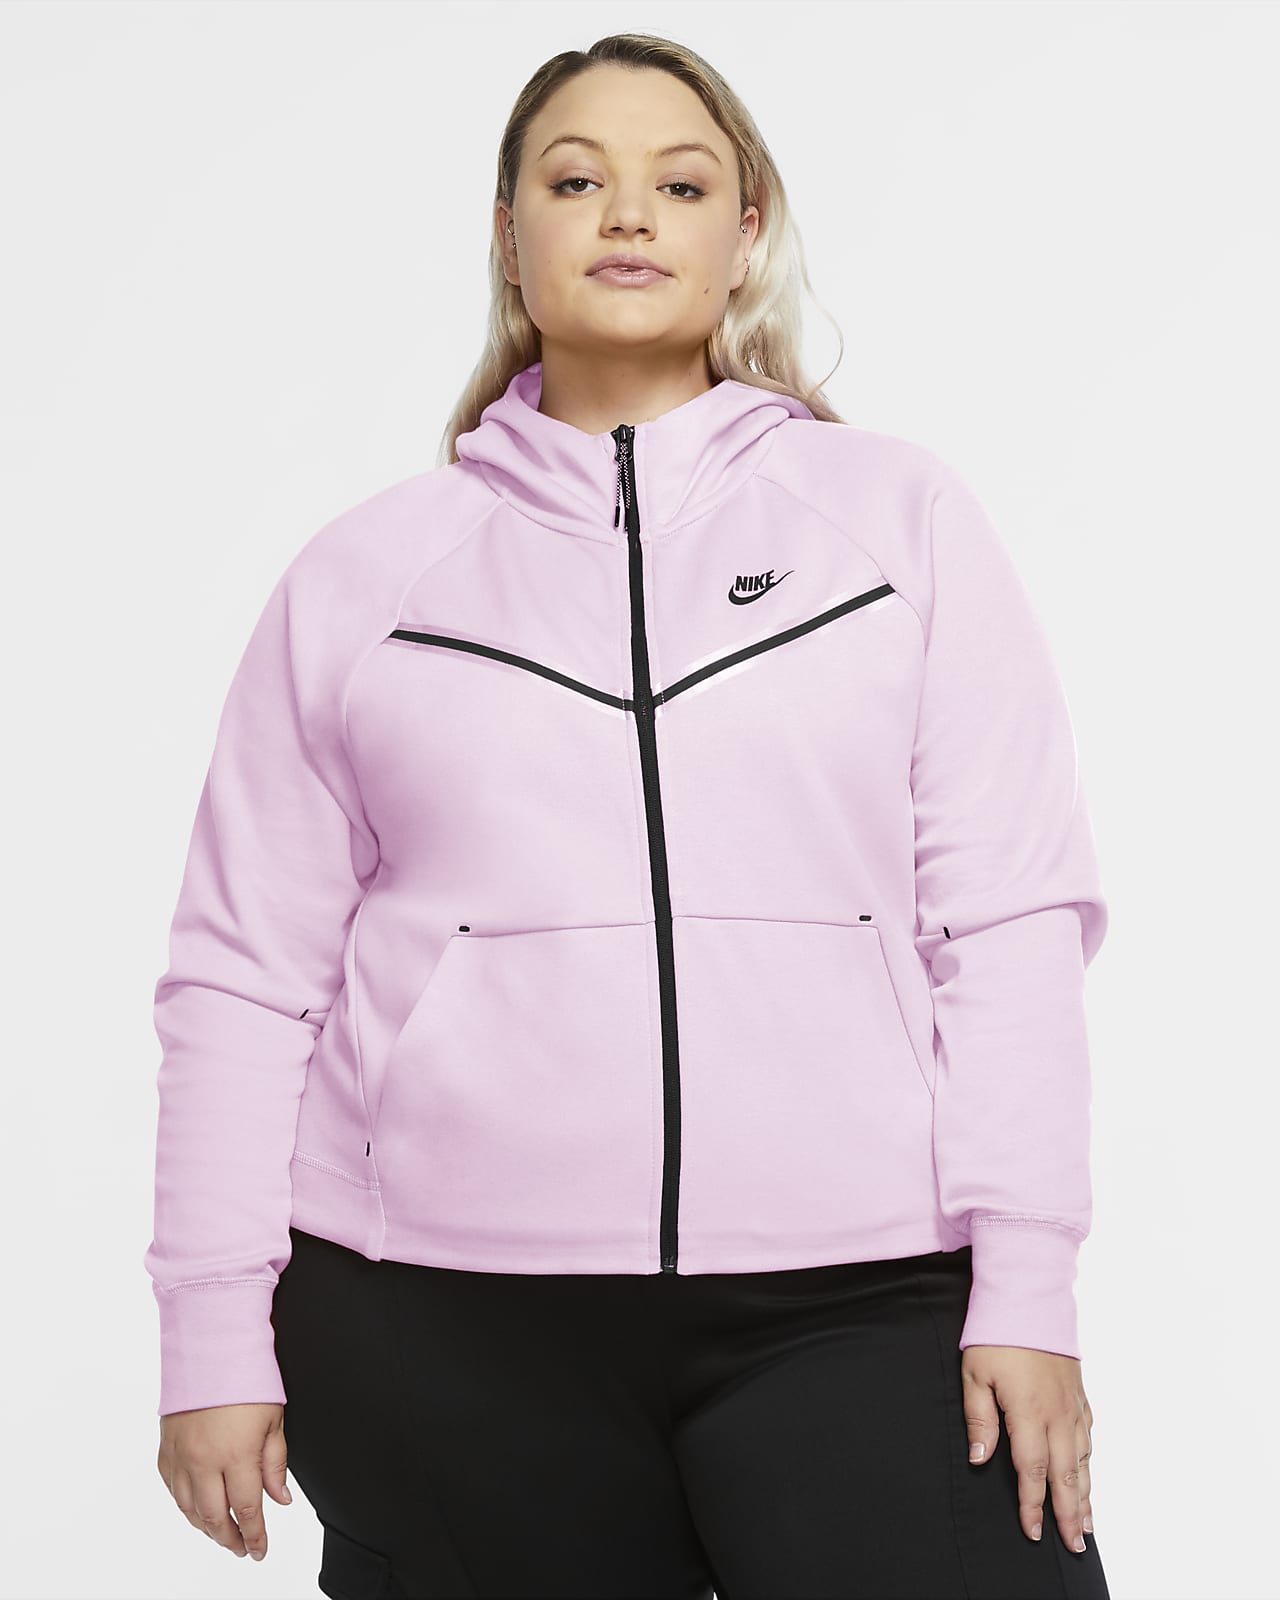 Nike Sportswear Tech Fleece Windrunner hettejakke med hel glidelås til dame (Plus Size)